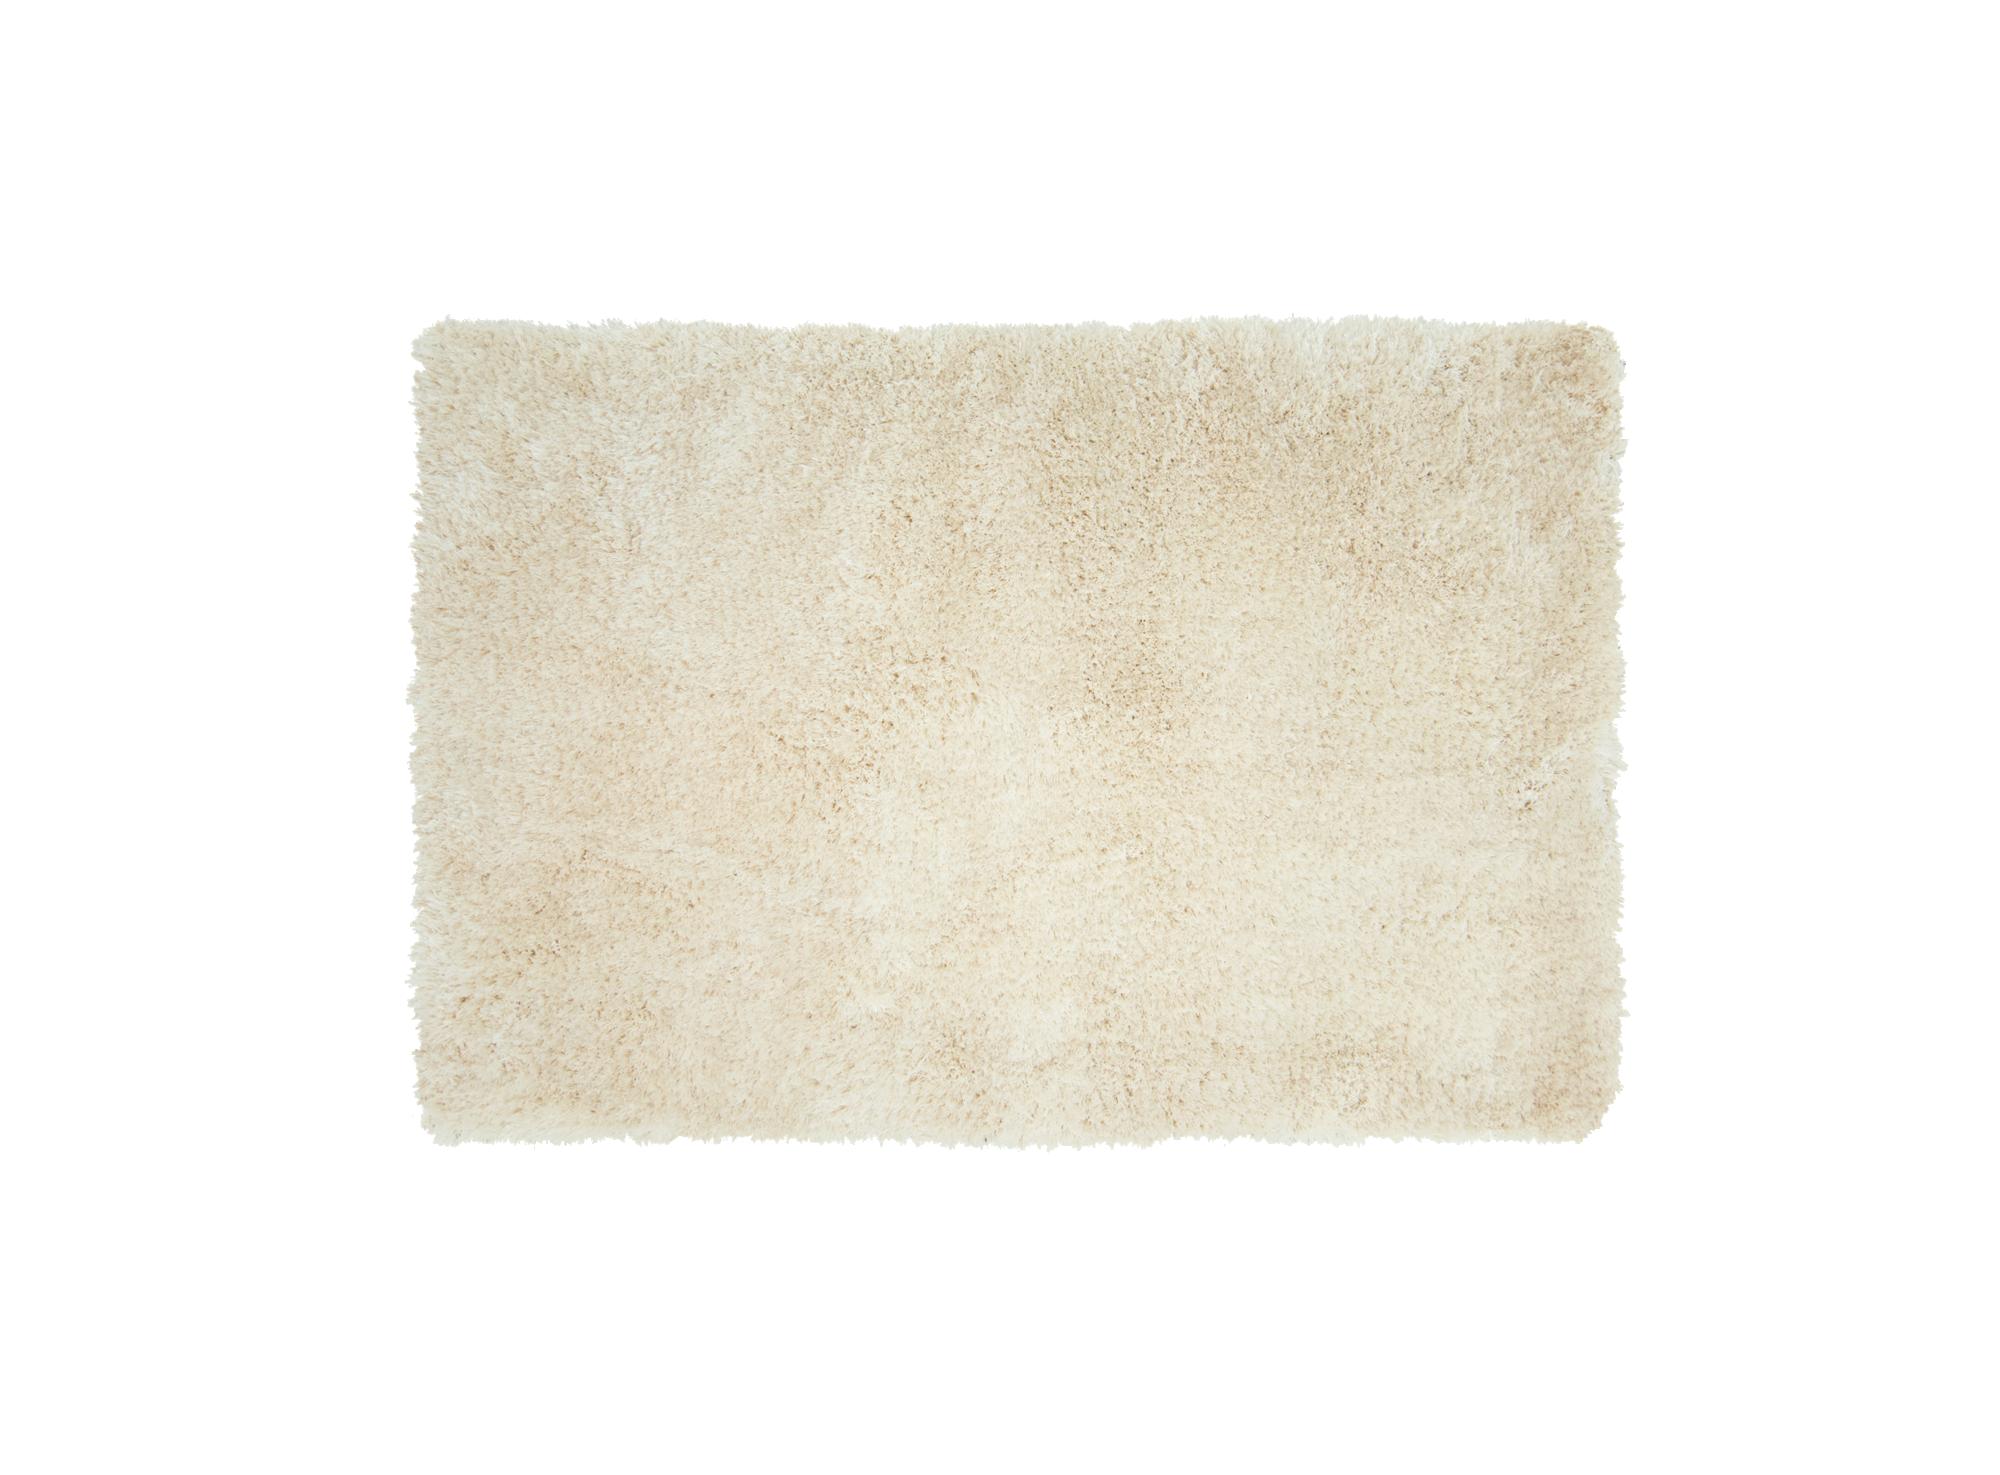 Tapis 120x170 100% polyester dos 100% coton coloris beige densite 21 ...